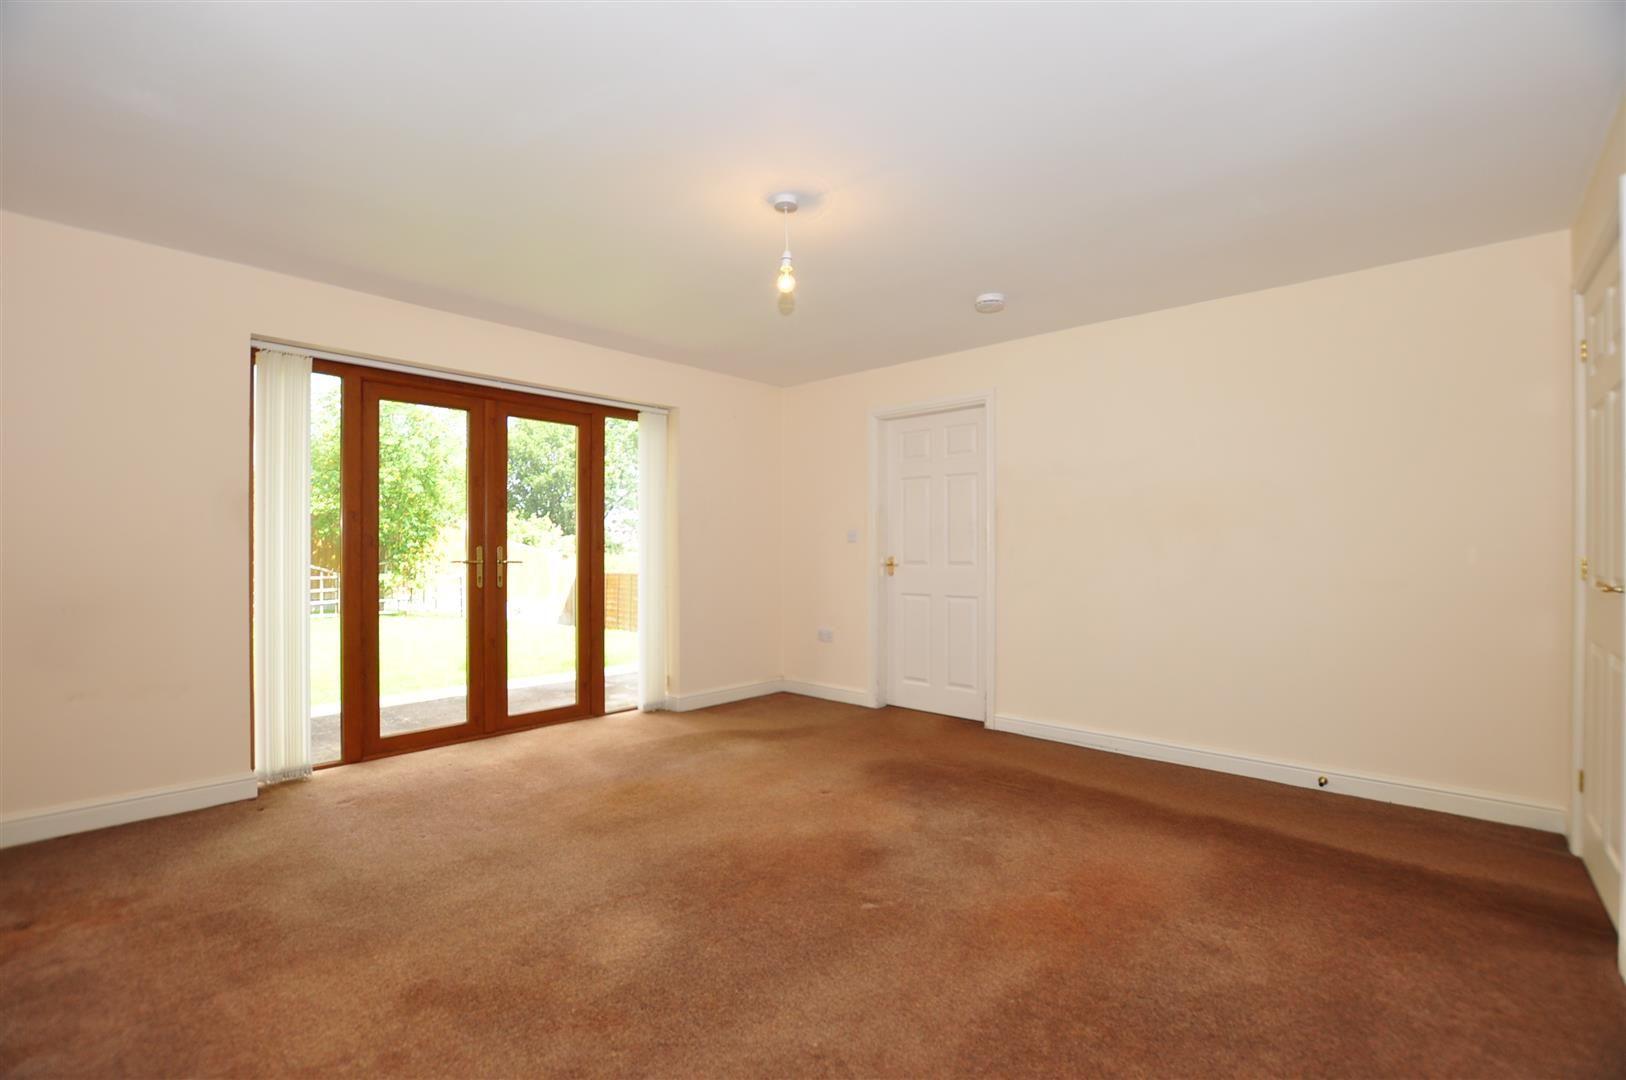 2 bed detached-bungalow for sale 2